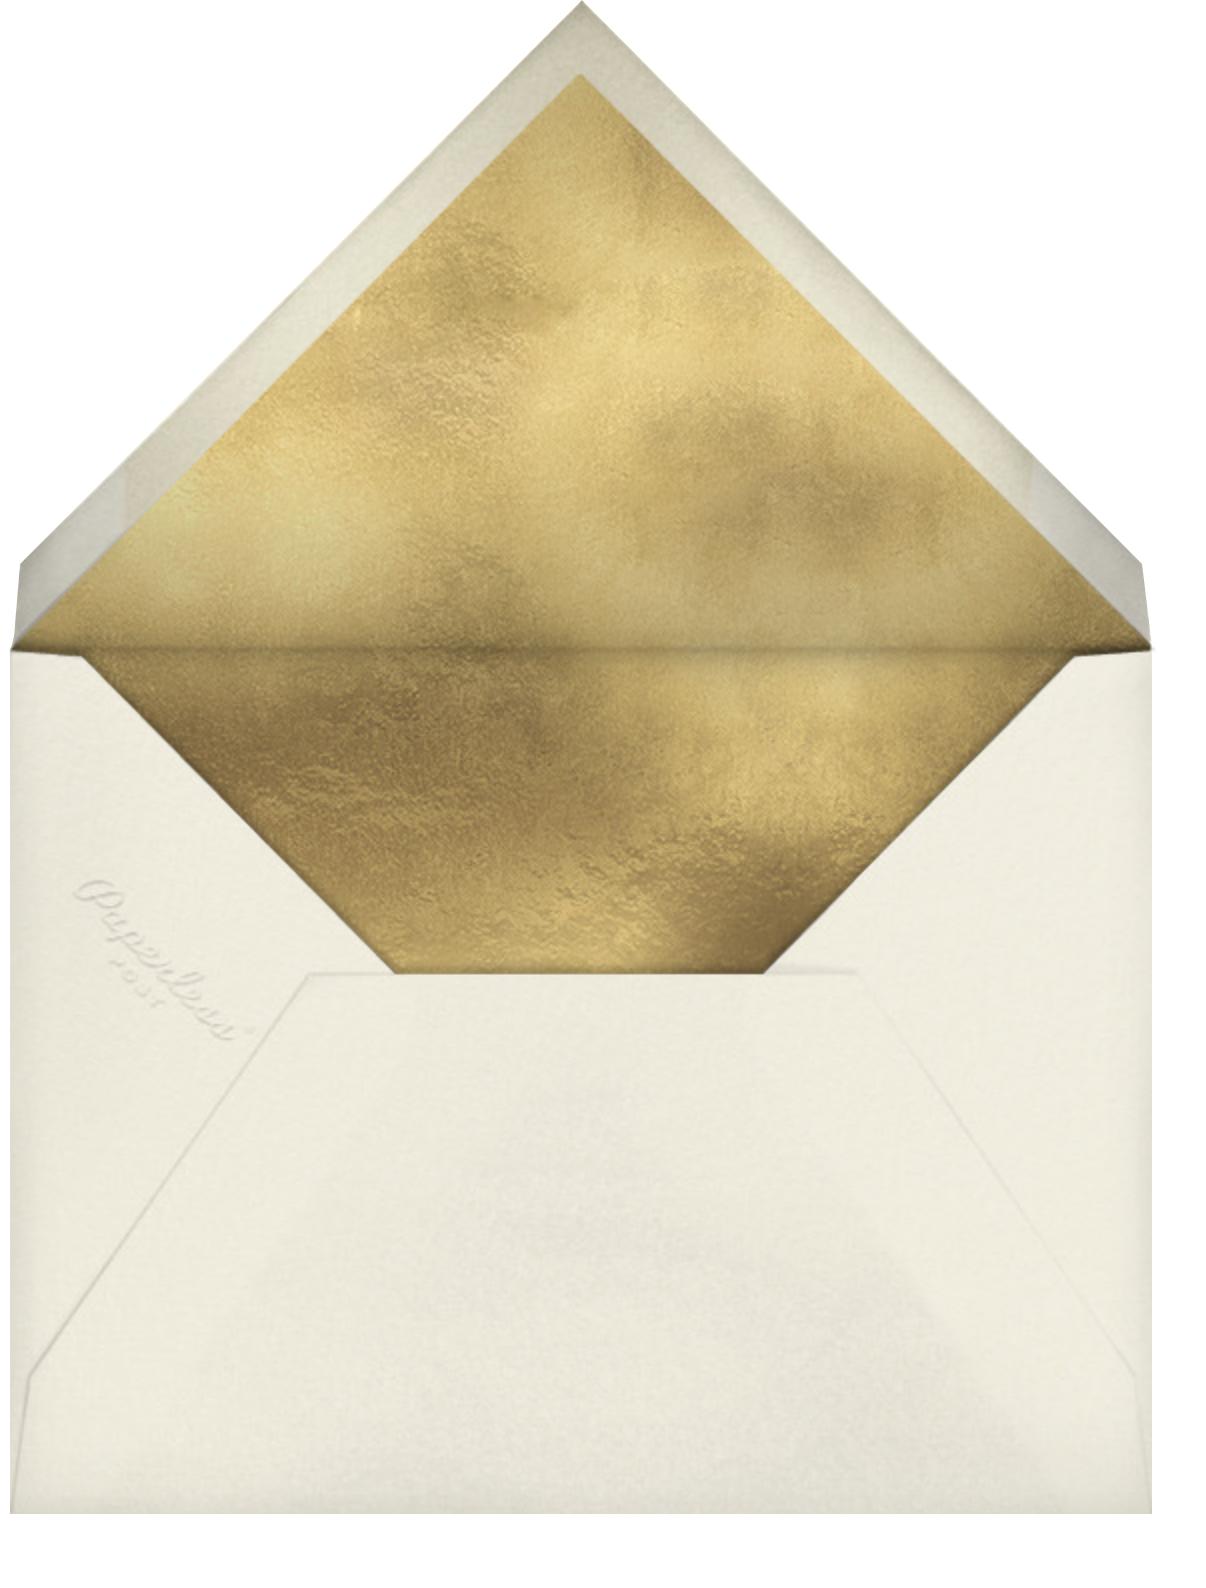 Neve - Puce - Kelly Wearstler - Christmas party - envelope back